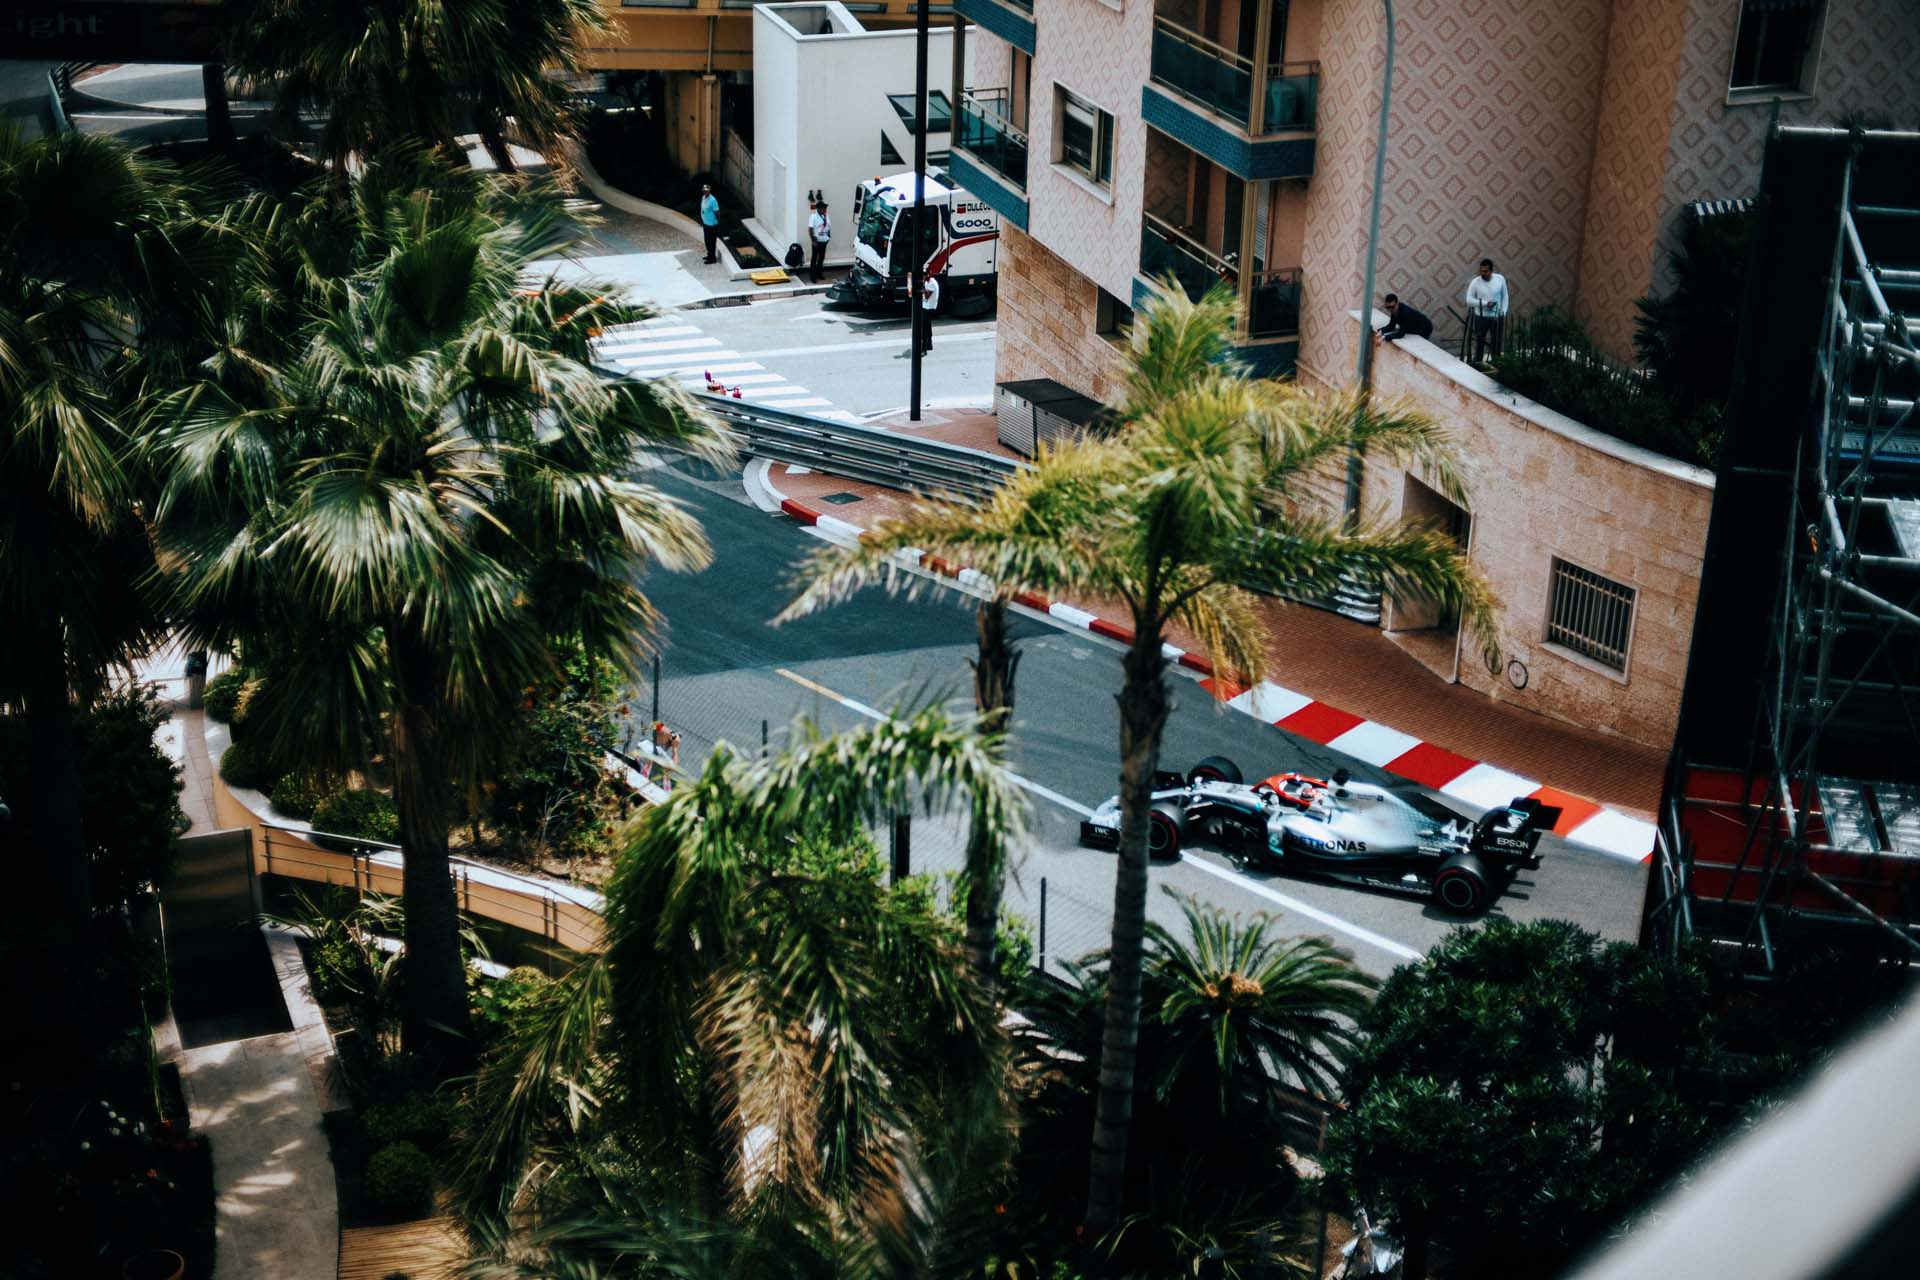 Großer Preis von Monaco 2019, Samstag - Paul Ripke